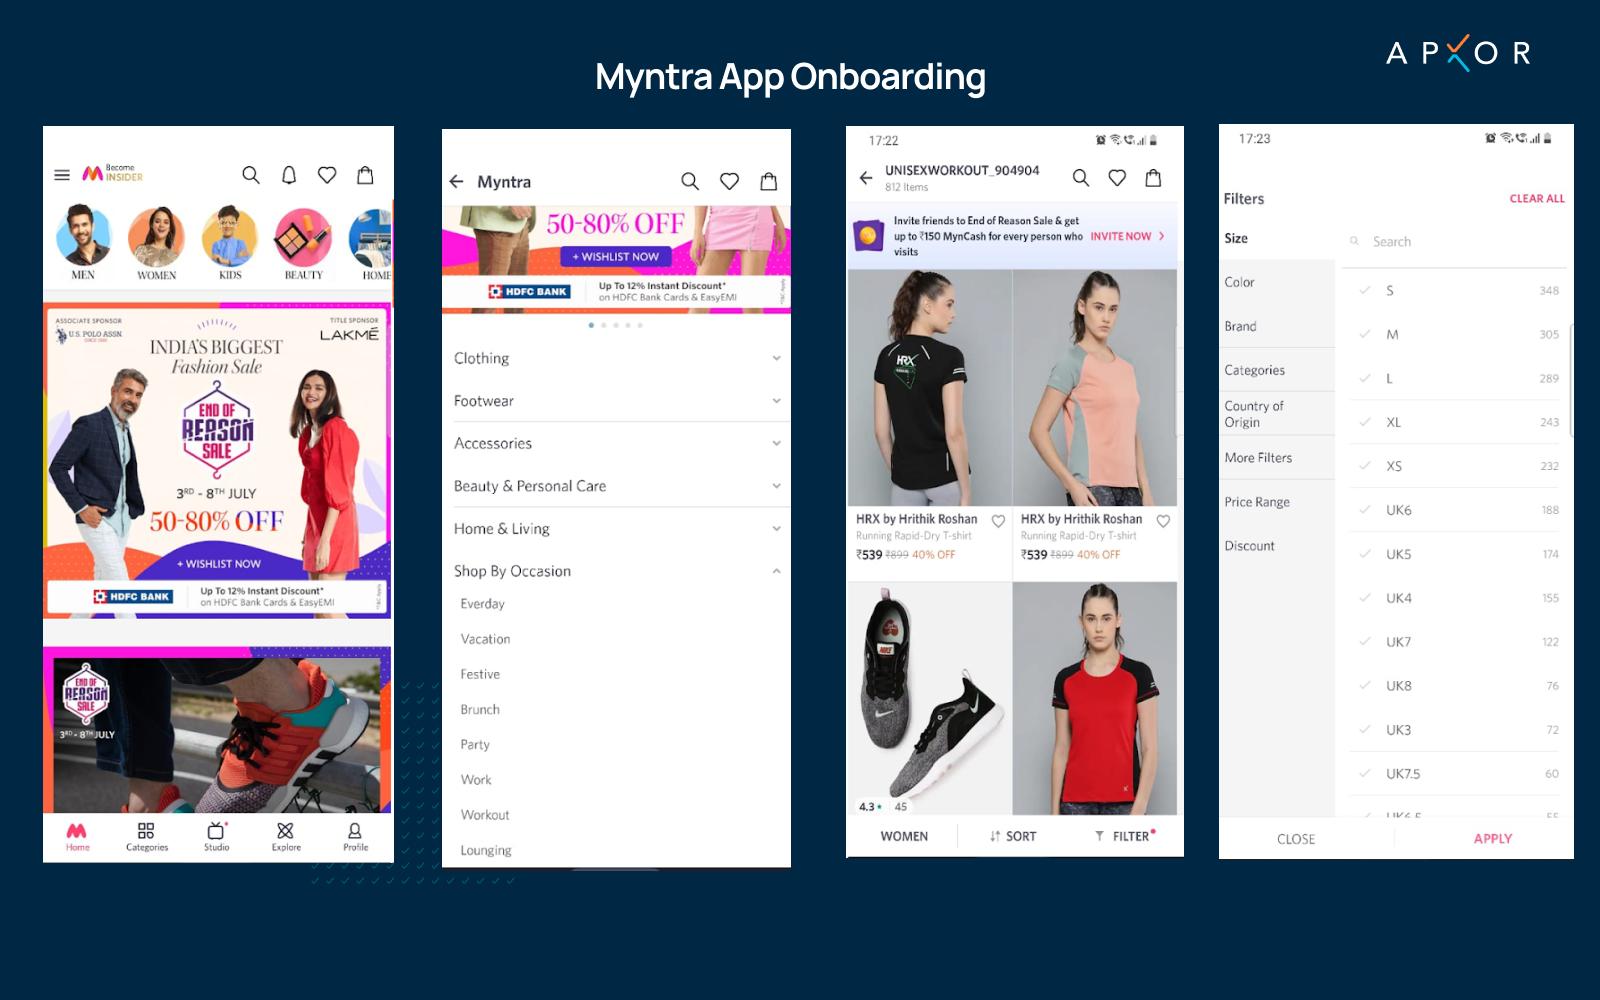 Myntra app onboarding flow image by Apxor